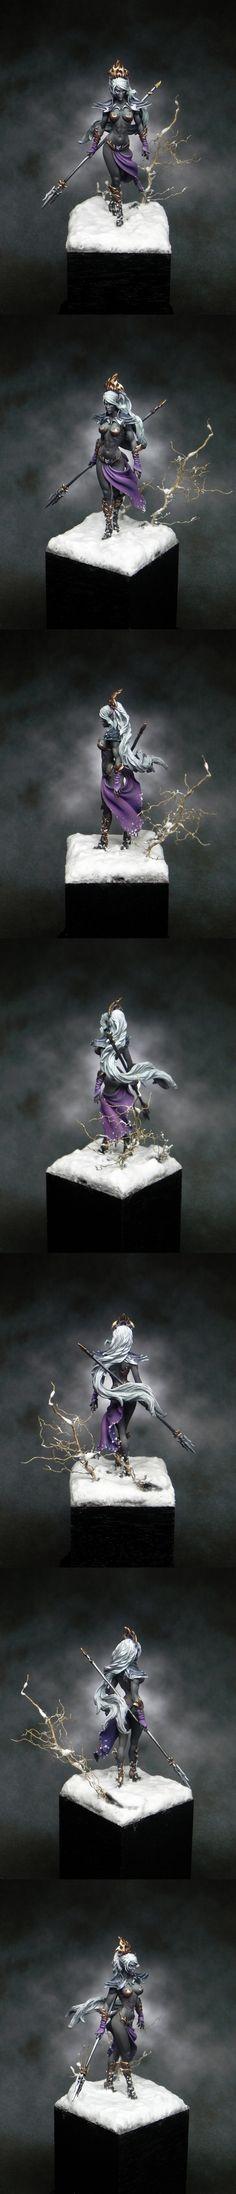 Luaayne the Drow Sorceress